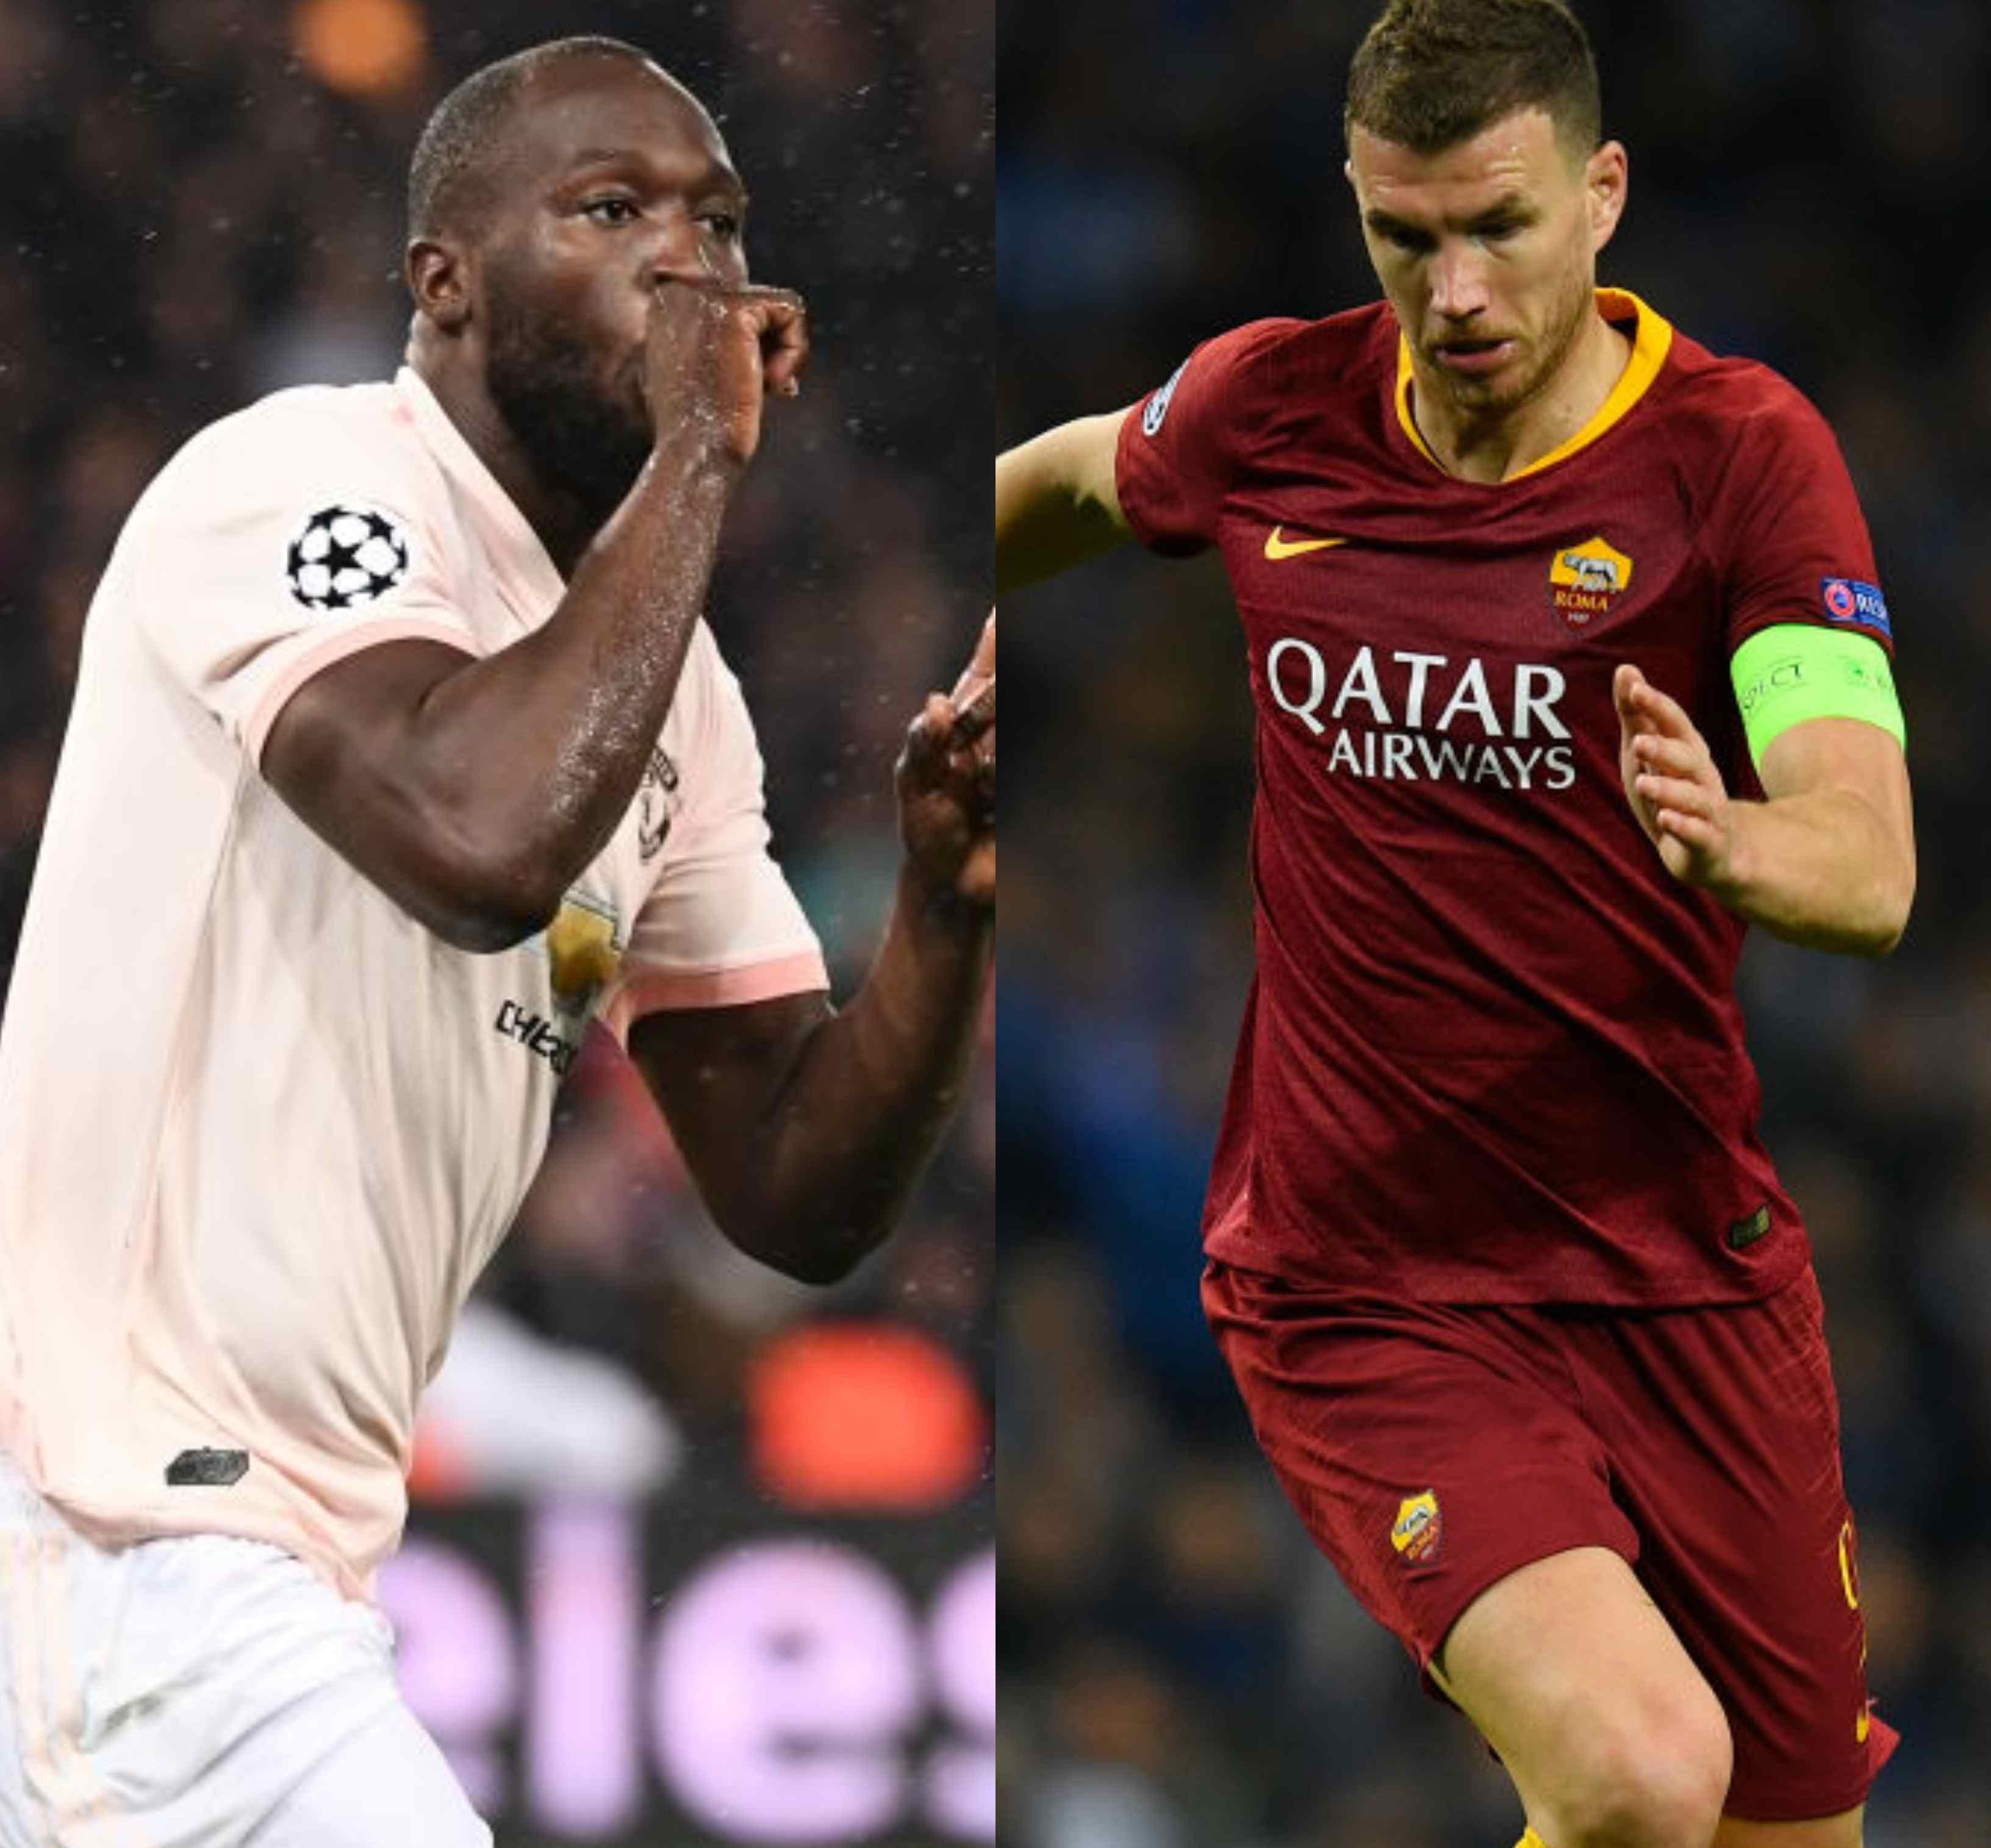 Lukaku (Manchester United) o Dzeko (Roma)